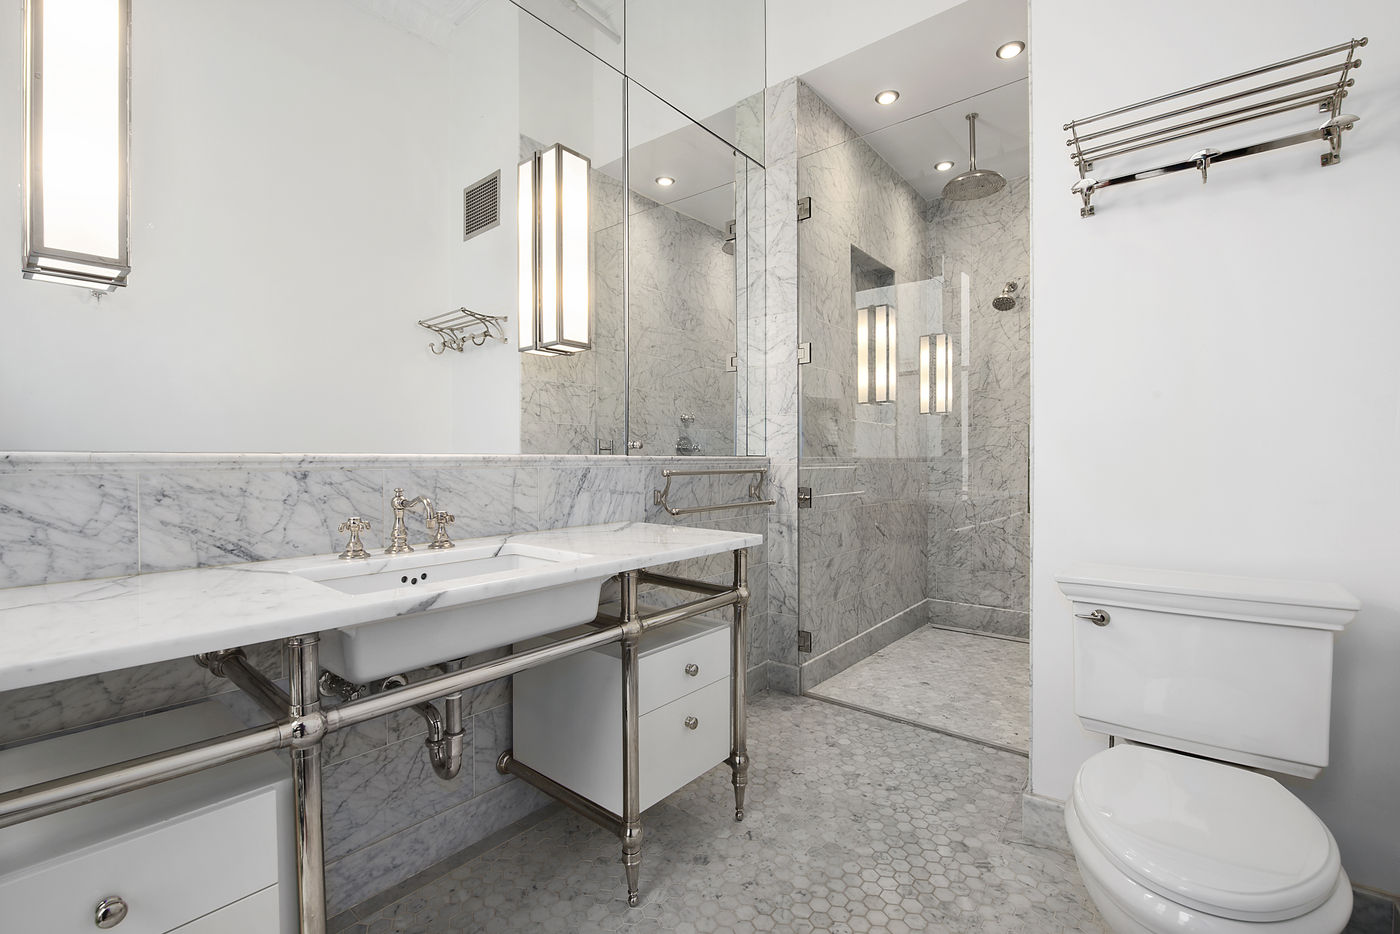 39 Worth Street, Cool Listings, Tribeca, Alexander Wang, Holly Brubach, Lofts, Manhattan Loft for sale